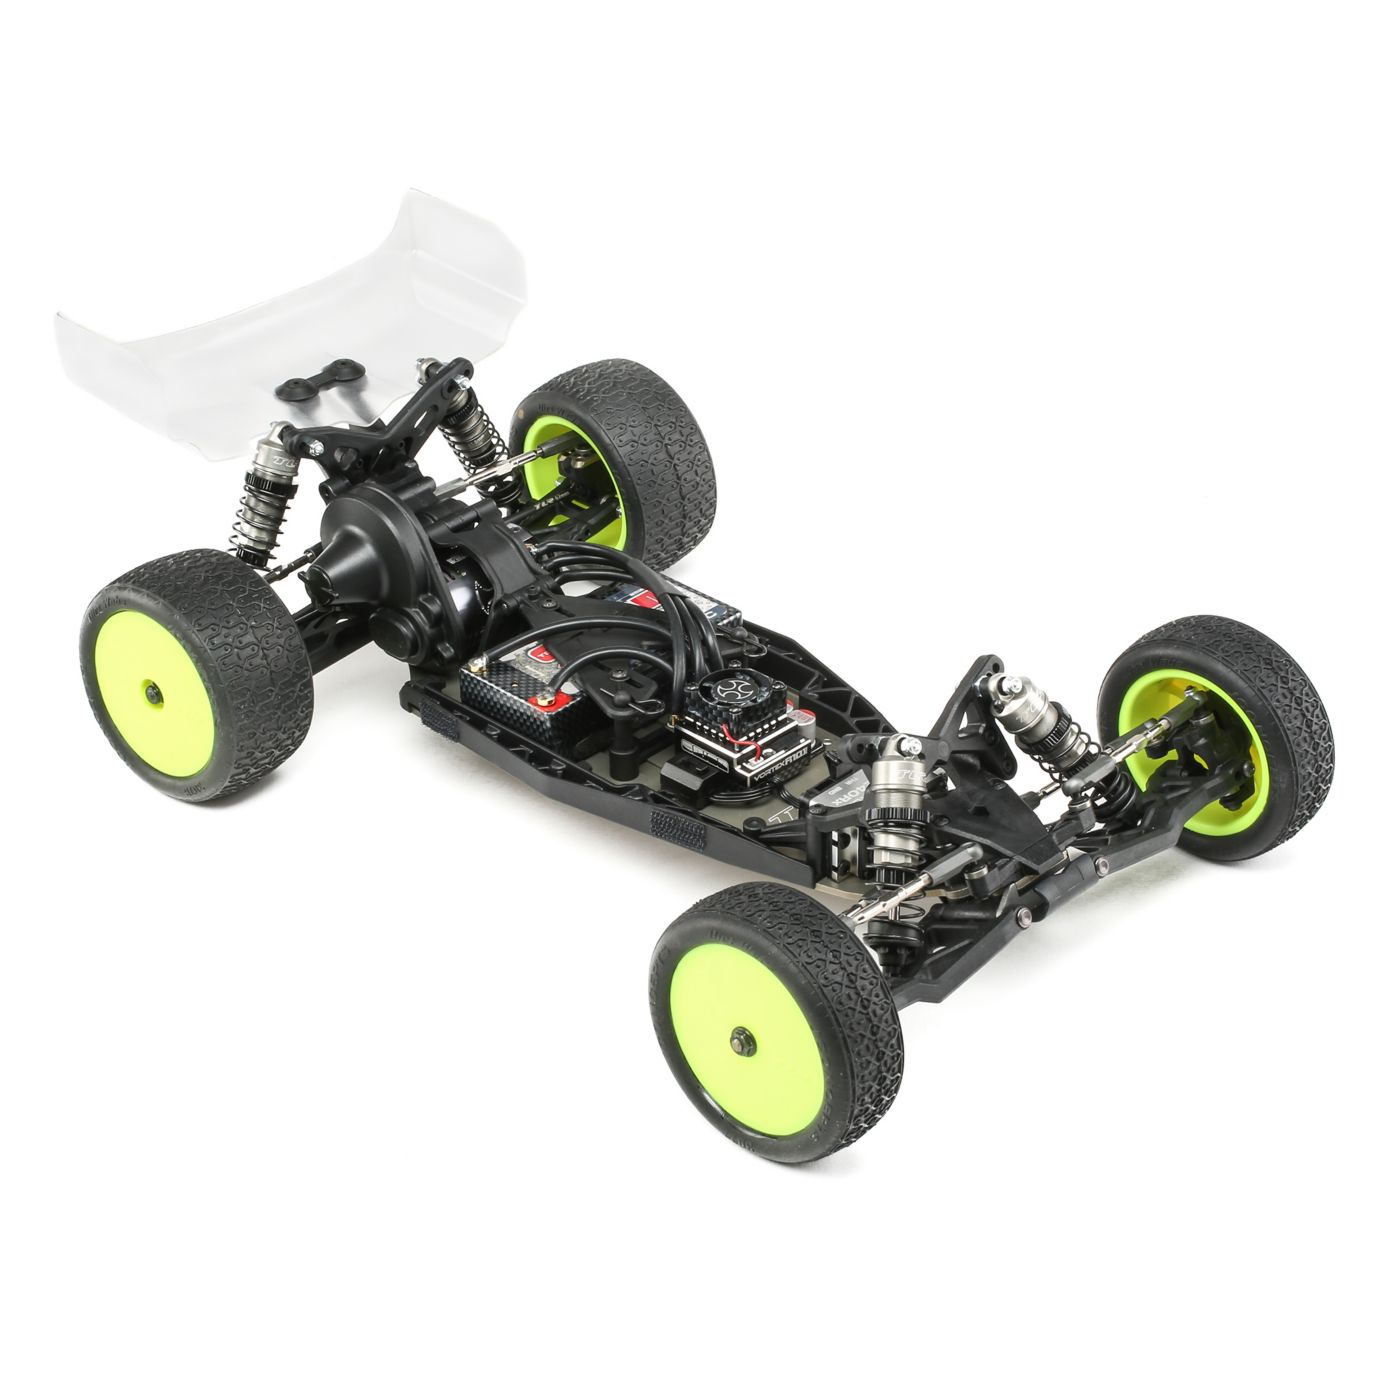 Team Losi Racing 22 4.0 Chassis